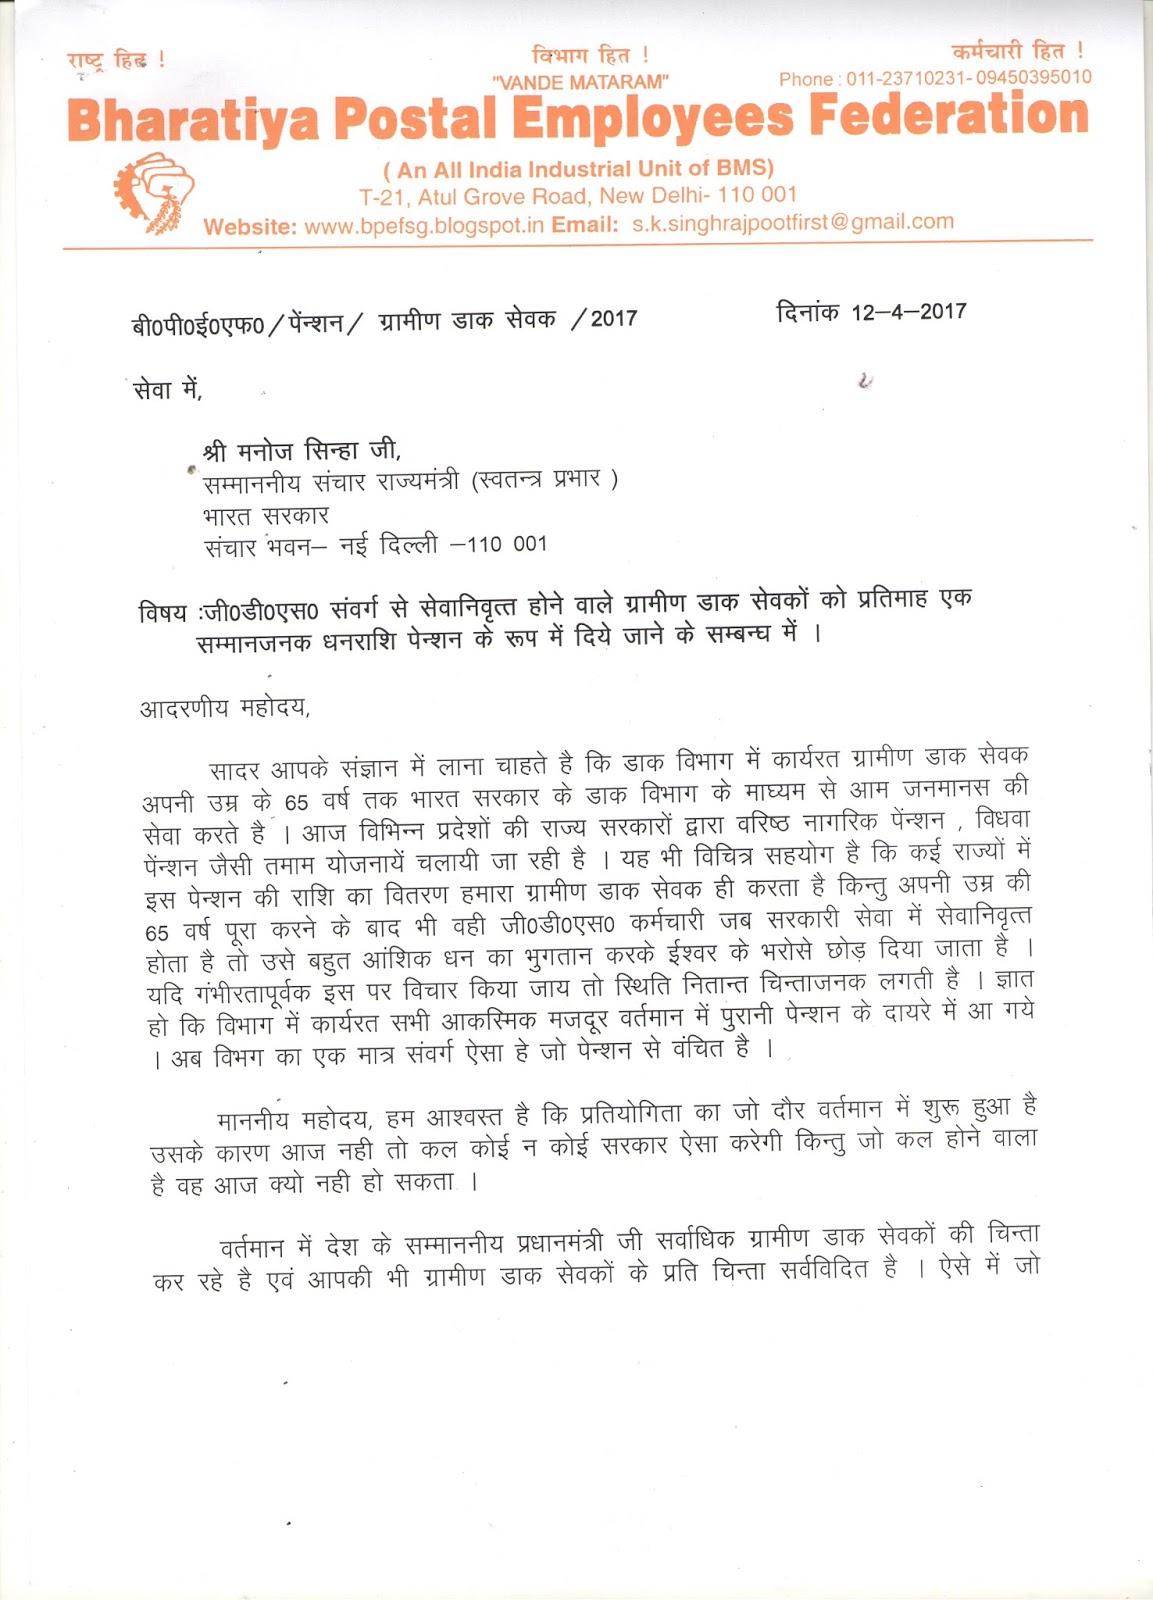 bharatiya postal employees federation tuesday 11 2017